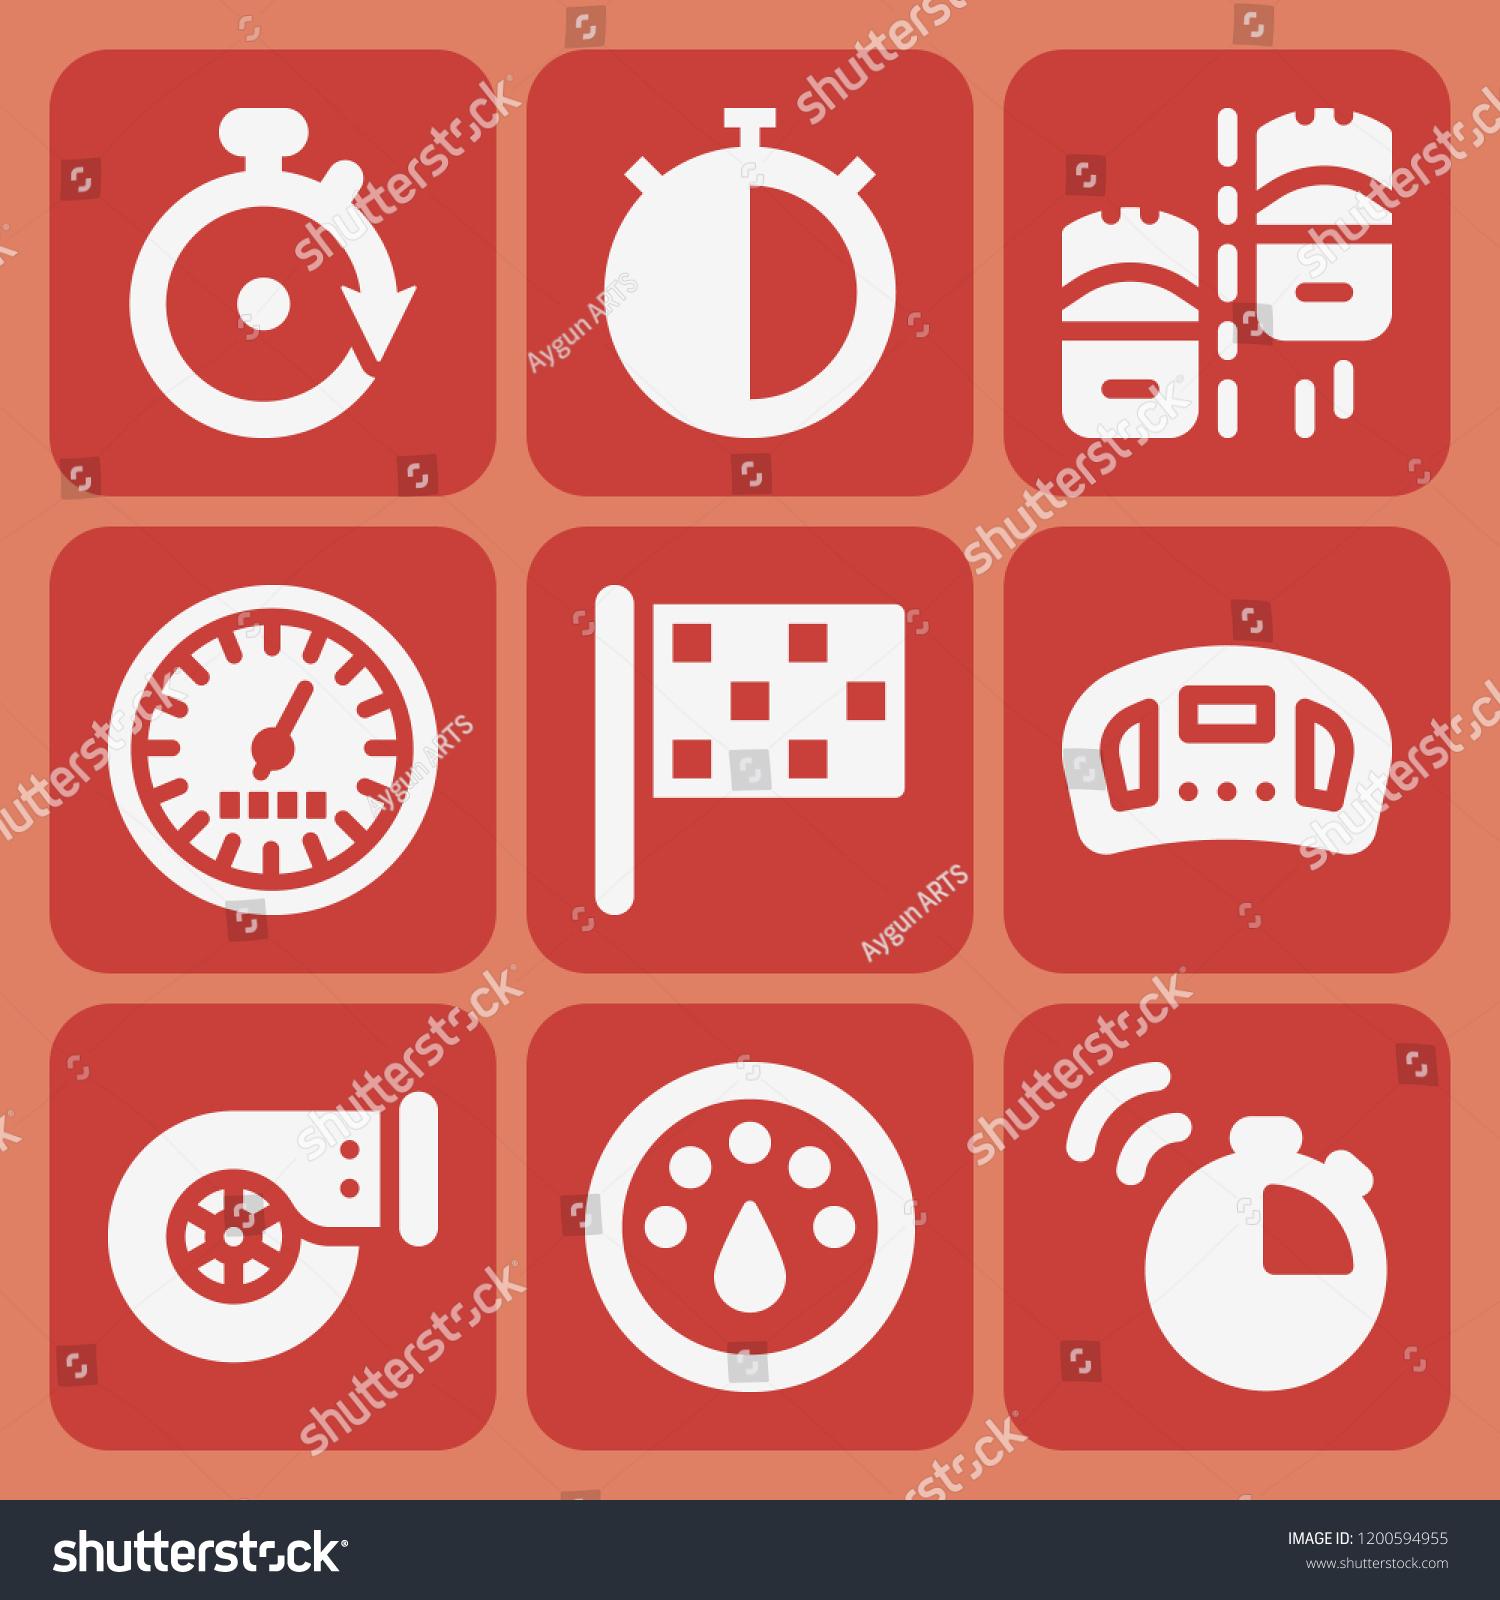 Visit matsclock. Com free download swf flash clocks for websites.